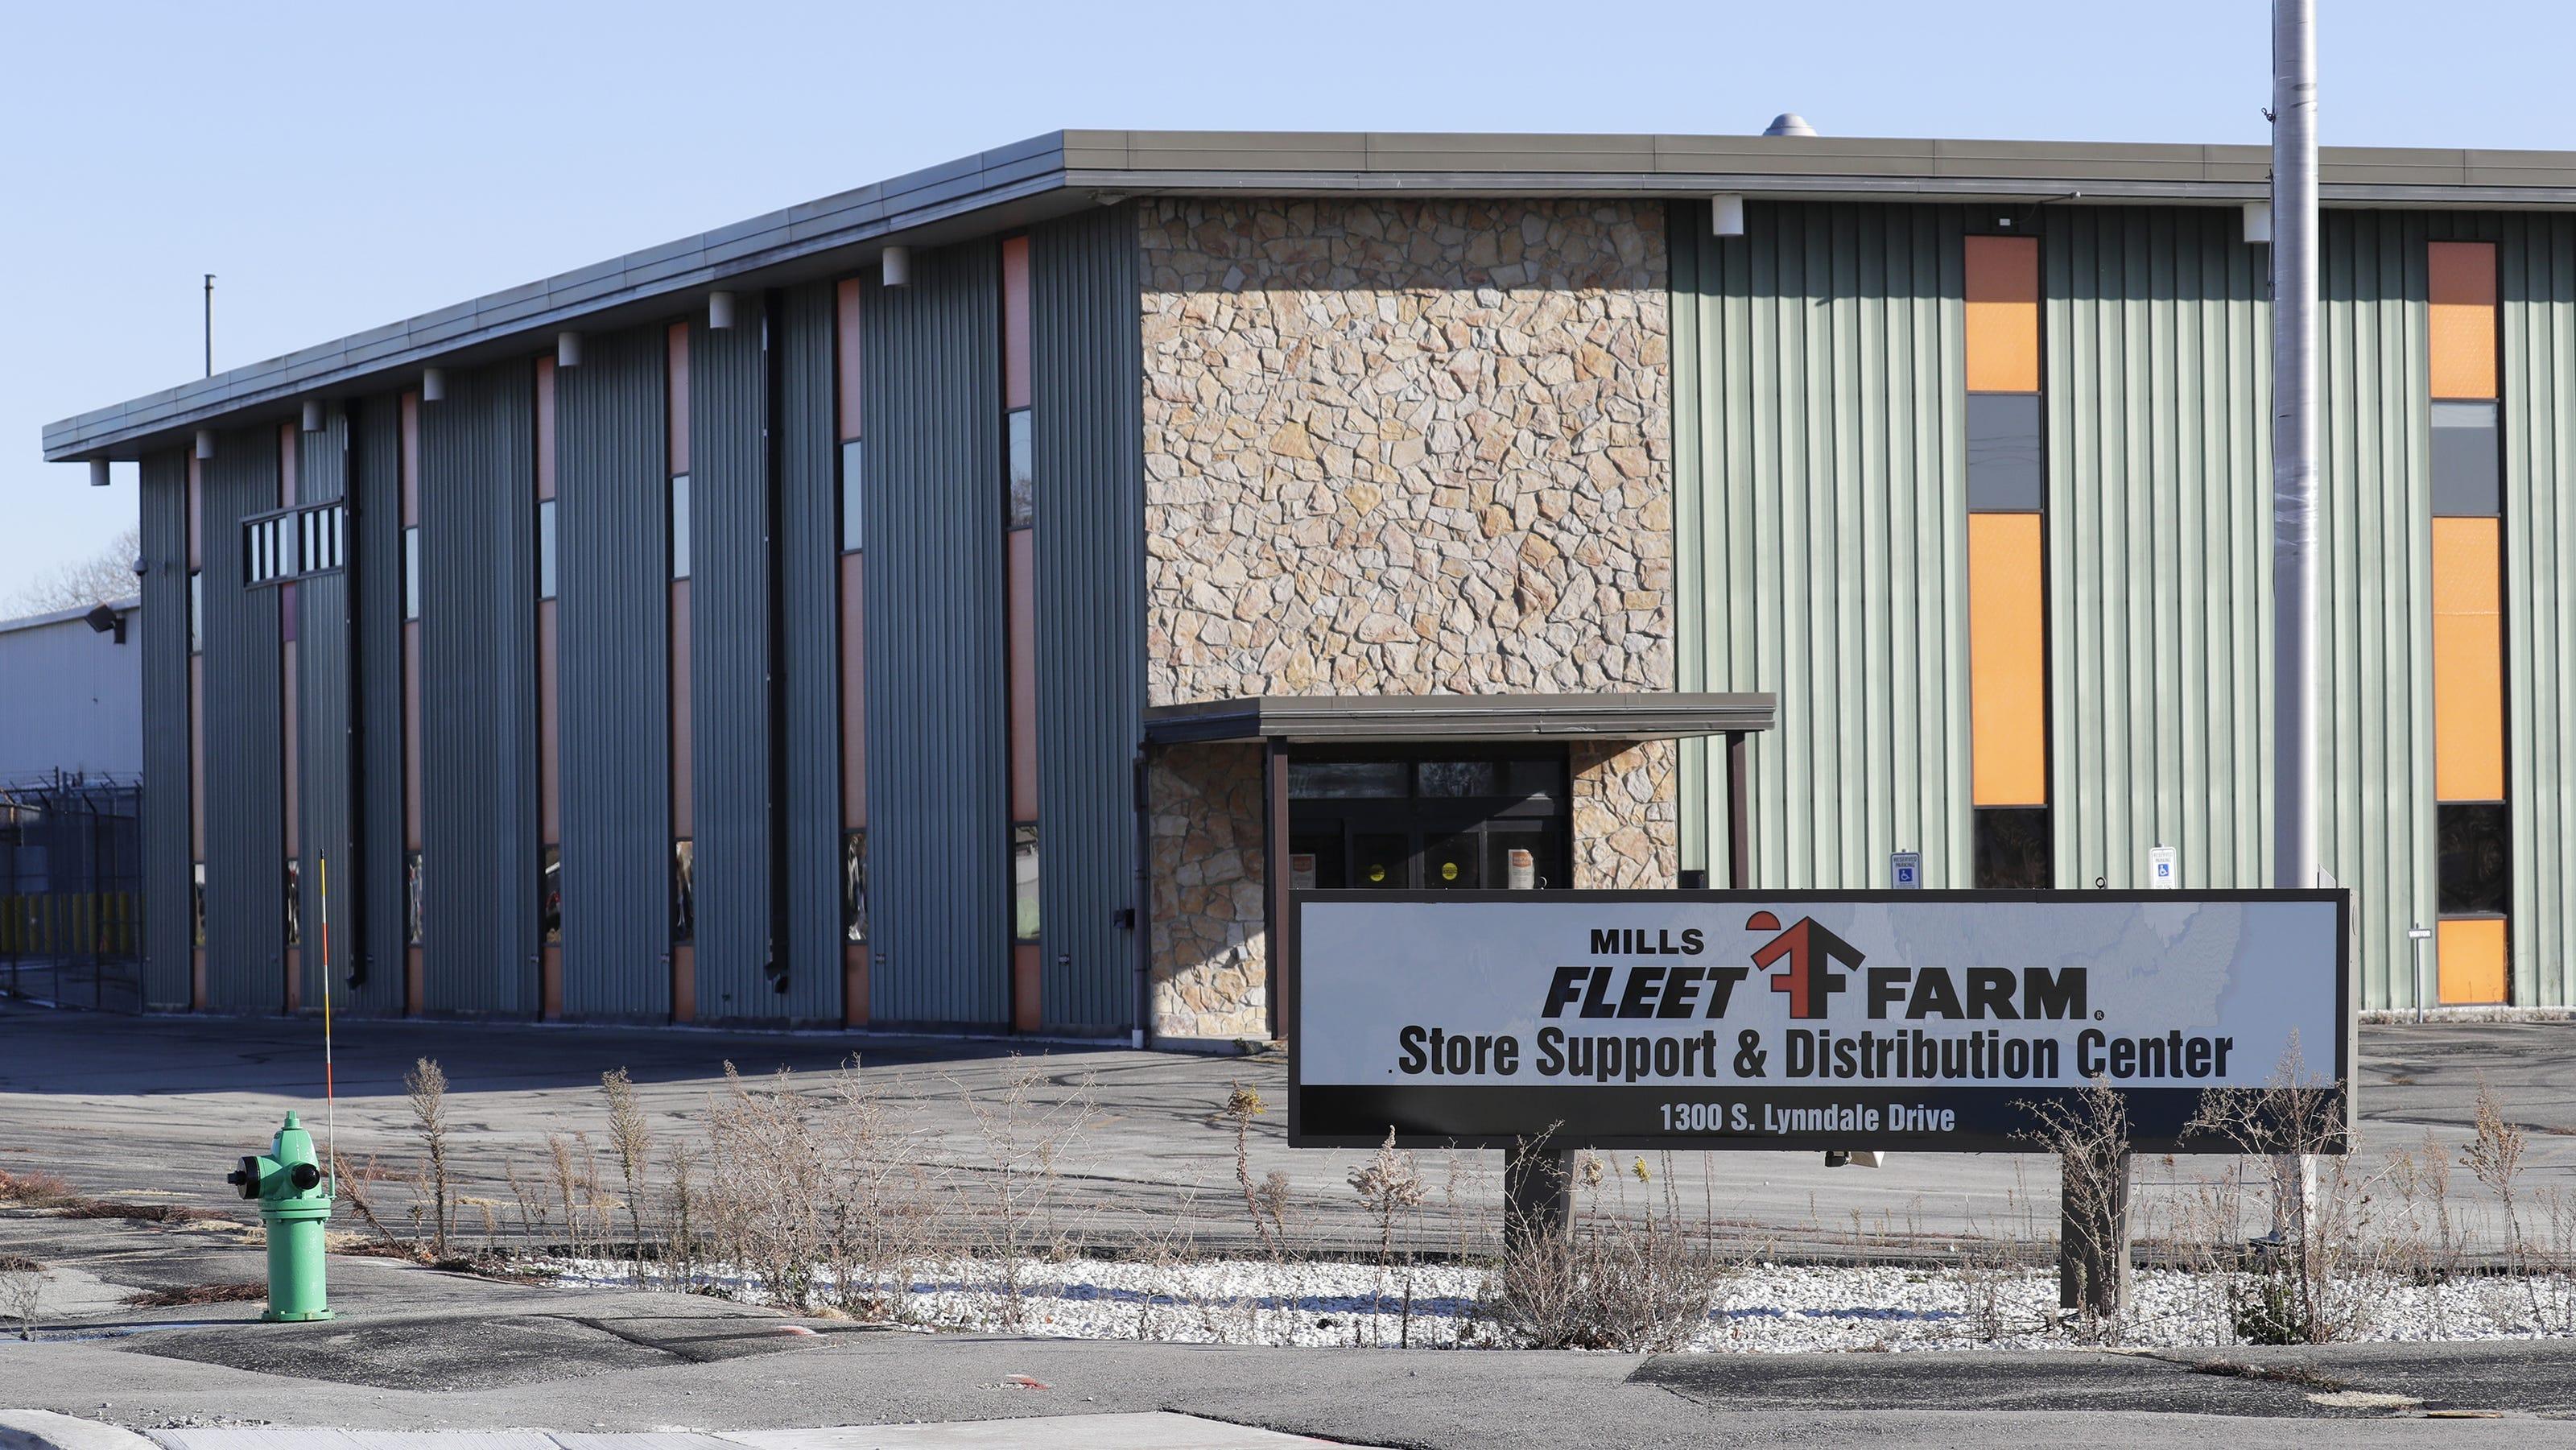 Fleet Farm Files Warn Notice With Dwd Of 42 Job Cuts In Appleton